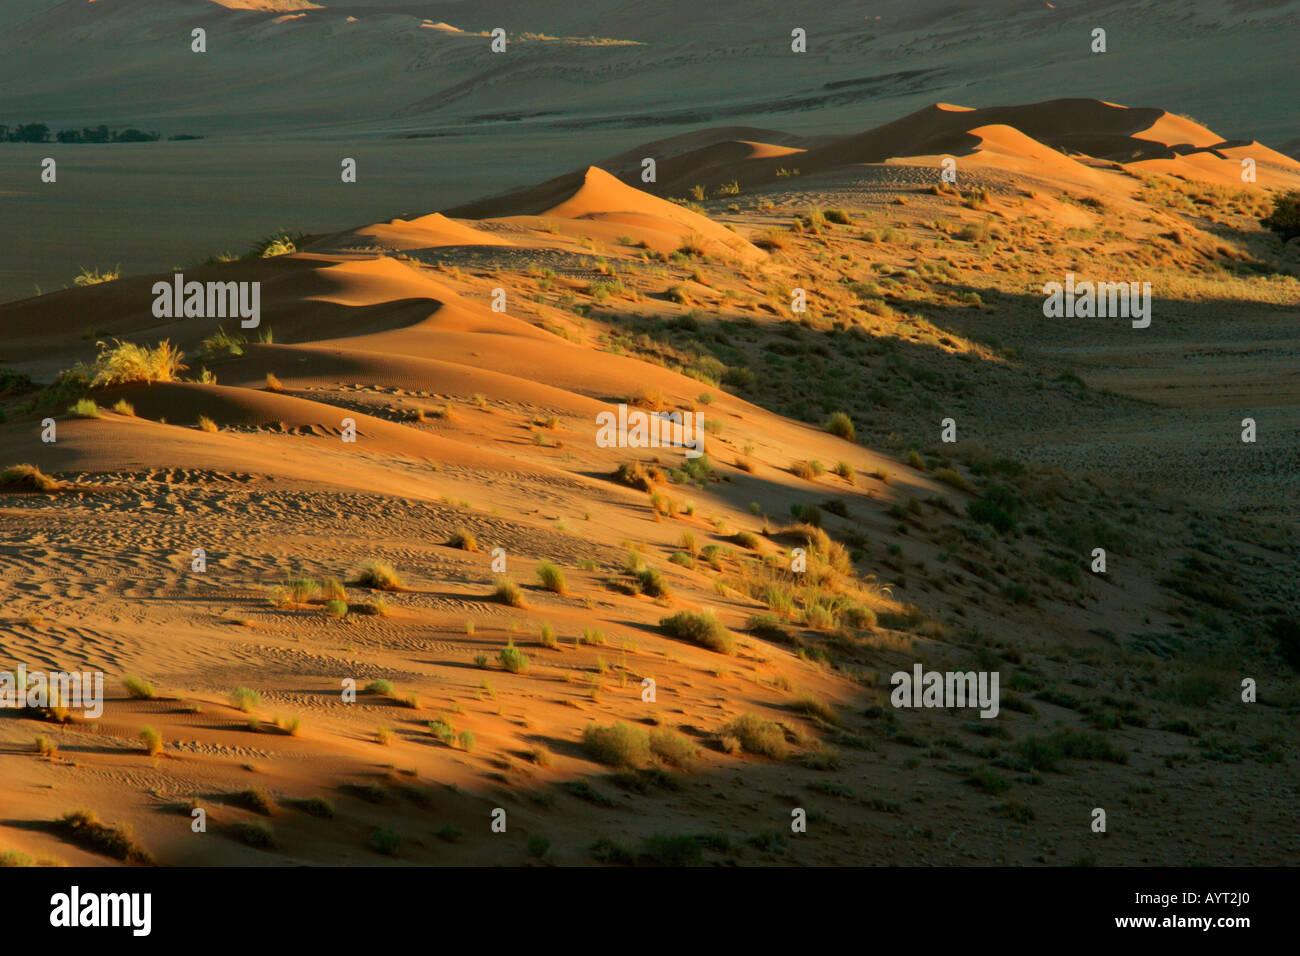 view from Elim dune to the dune Namib Namib desert Namib Naukluft Park Namibia Africa Stock Photo